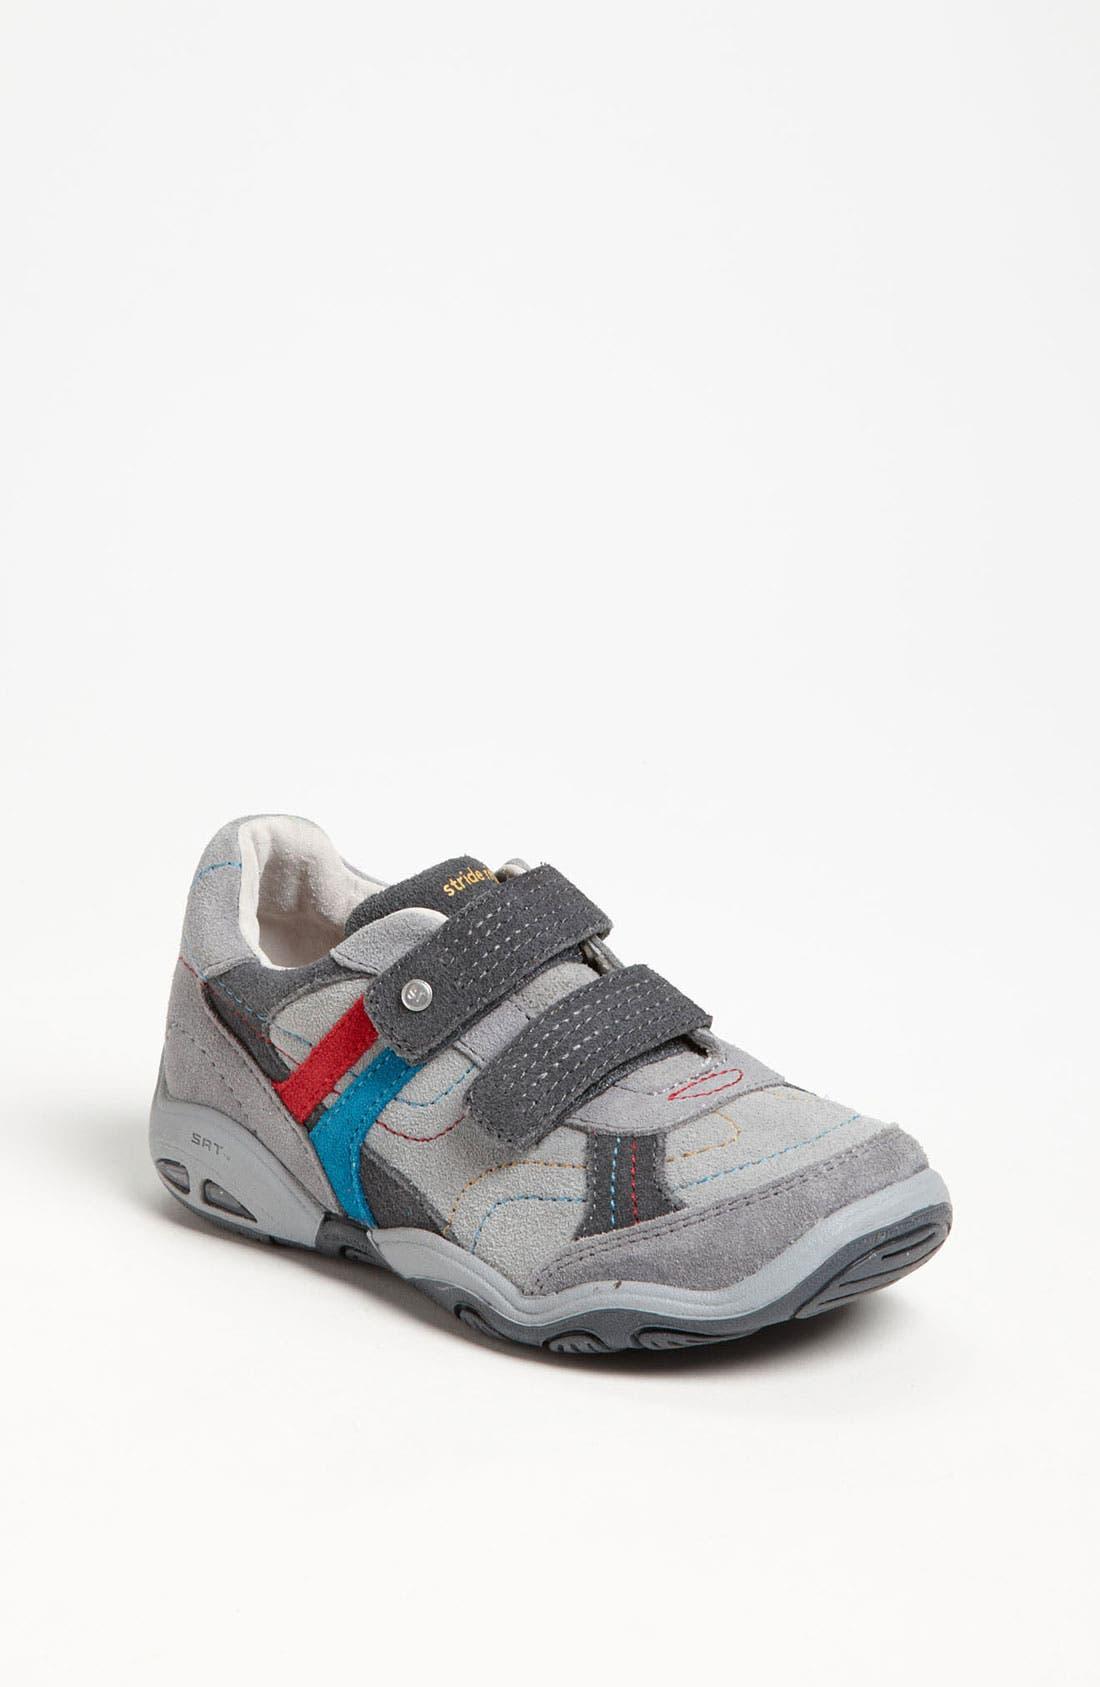 Alternate Image 1 Selected - Stride Rite 'Baxter' Sneaker (Toddler & Little Kid)